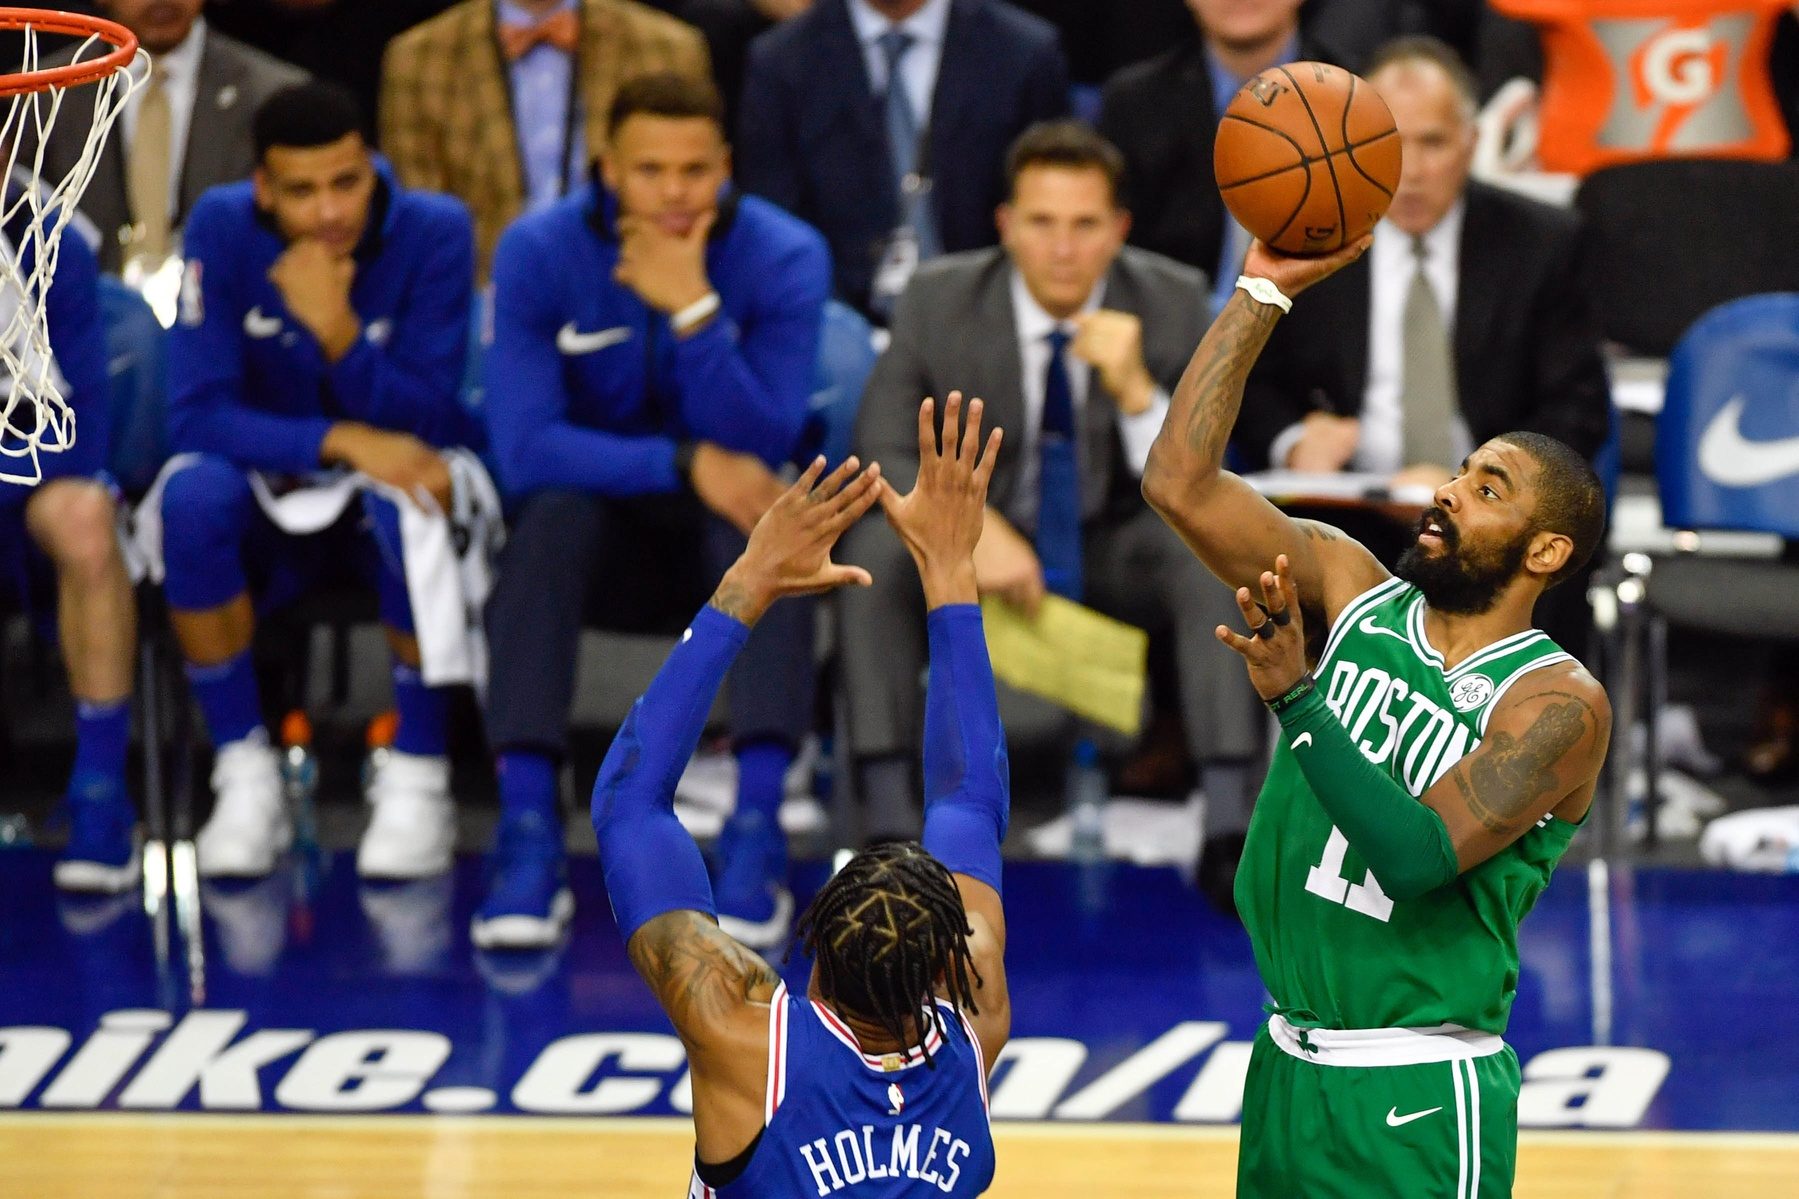 Your Morning Dump... Where balance makes the Celtics a really effin' tough team